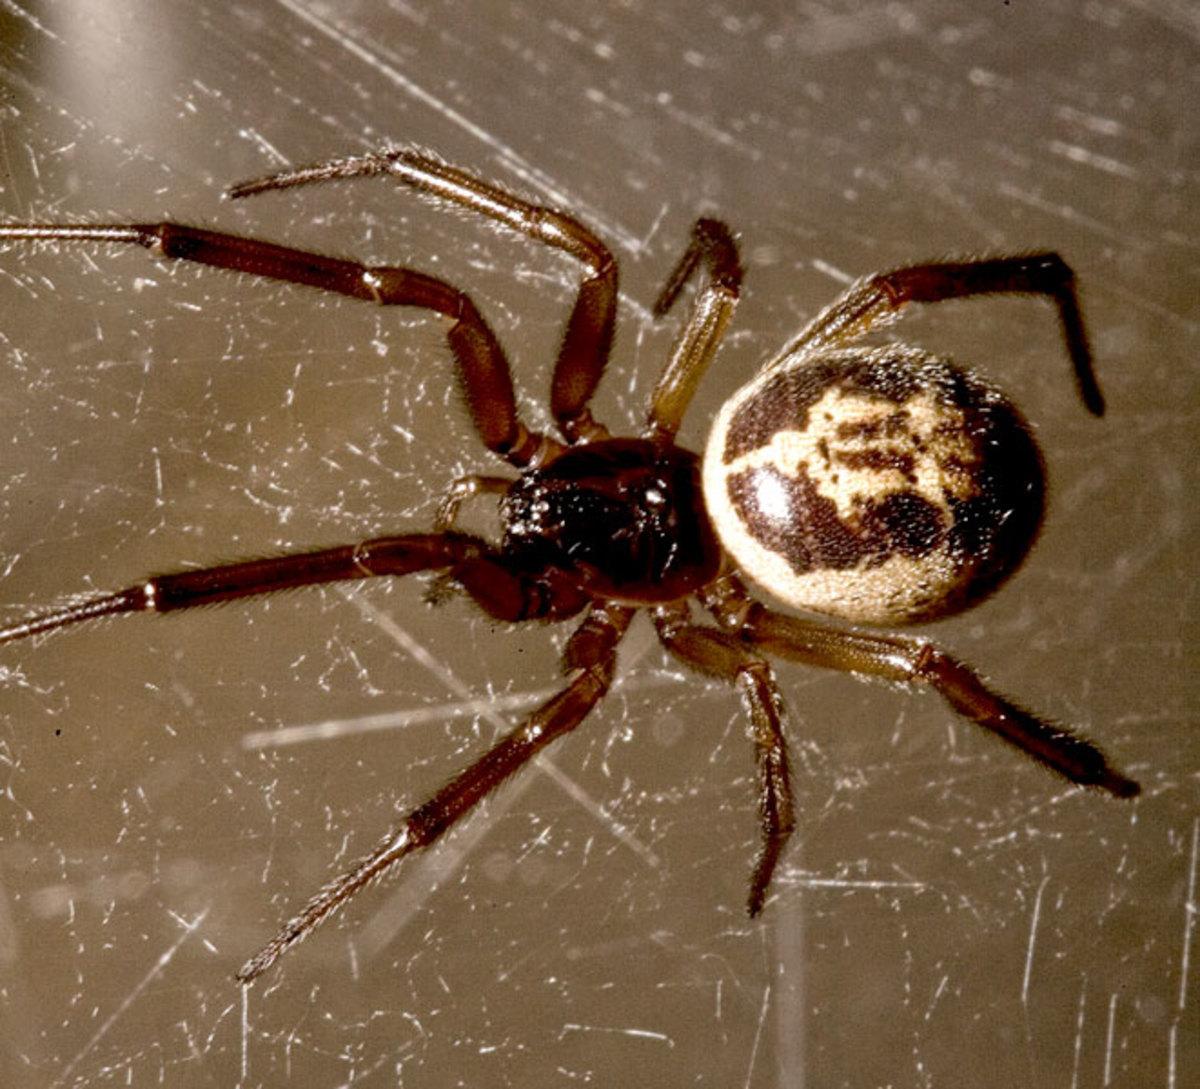 False widow spider (Steatoda nobilis) © Chris Leather